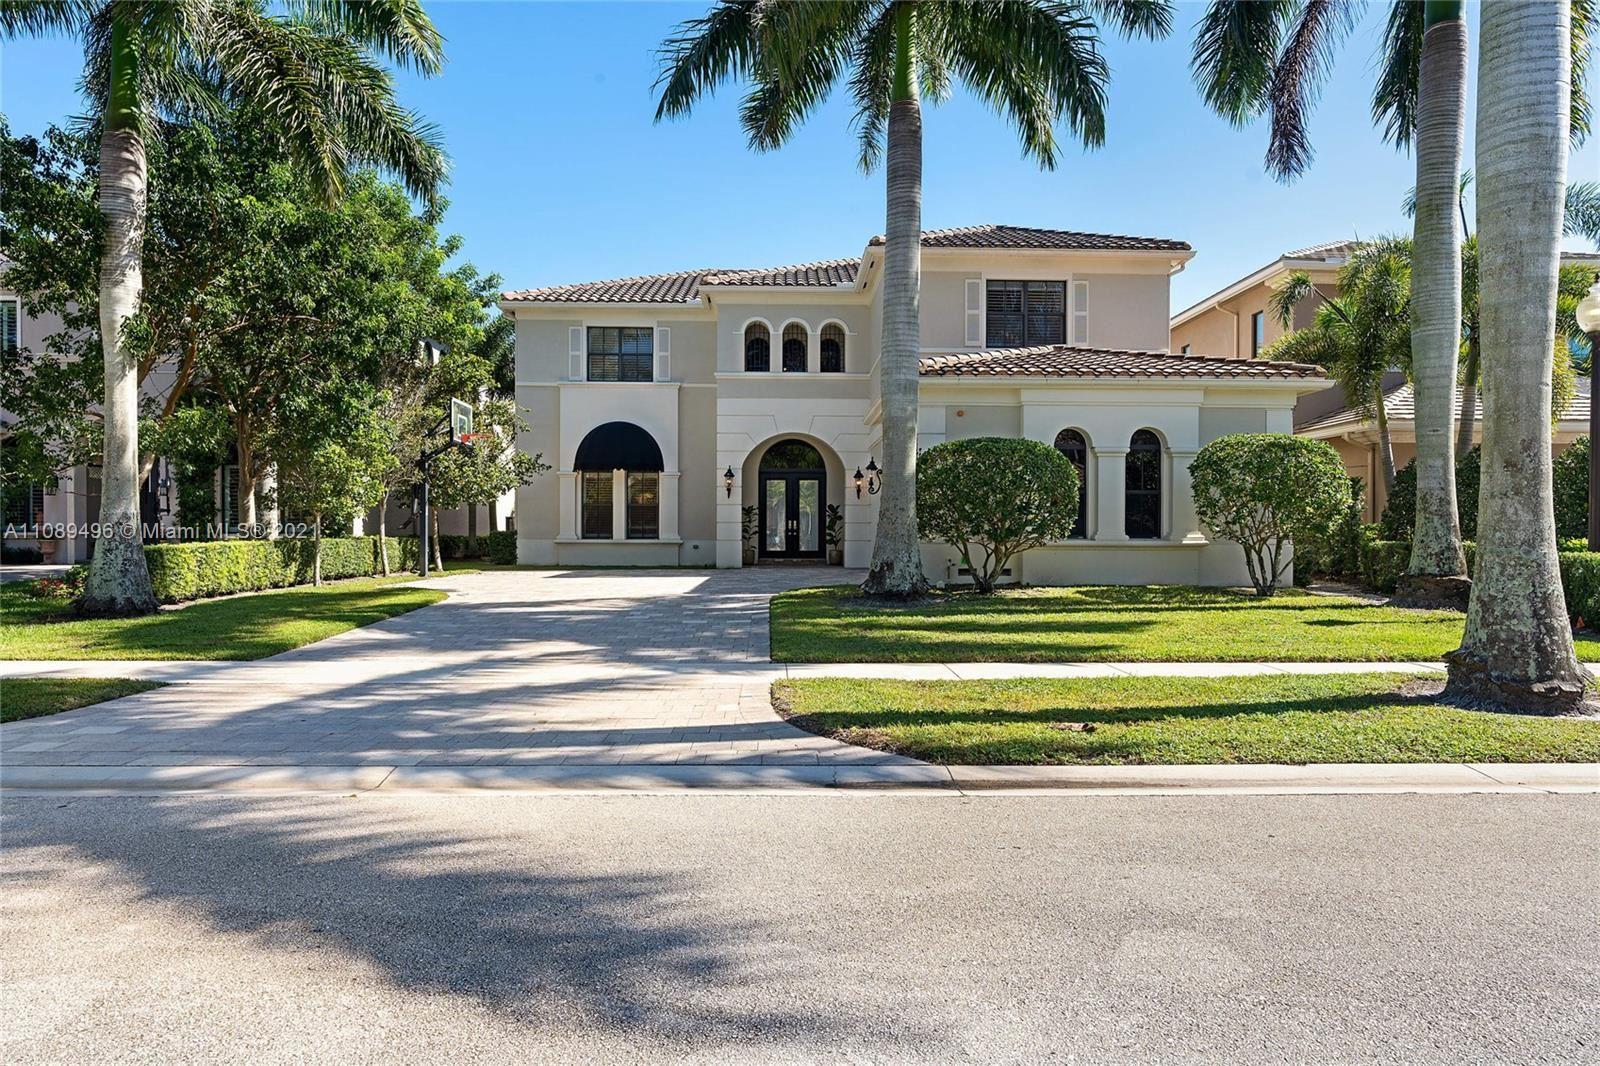 17752 Vecino Way, Boca Raton, FL 33496 - #: A11089496